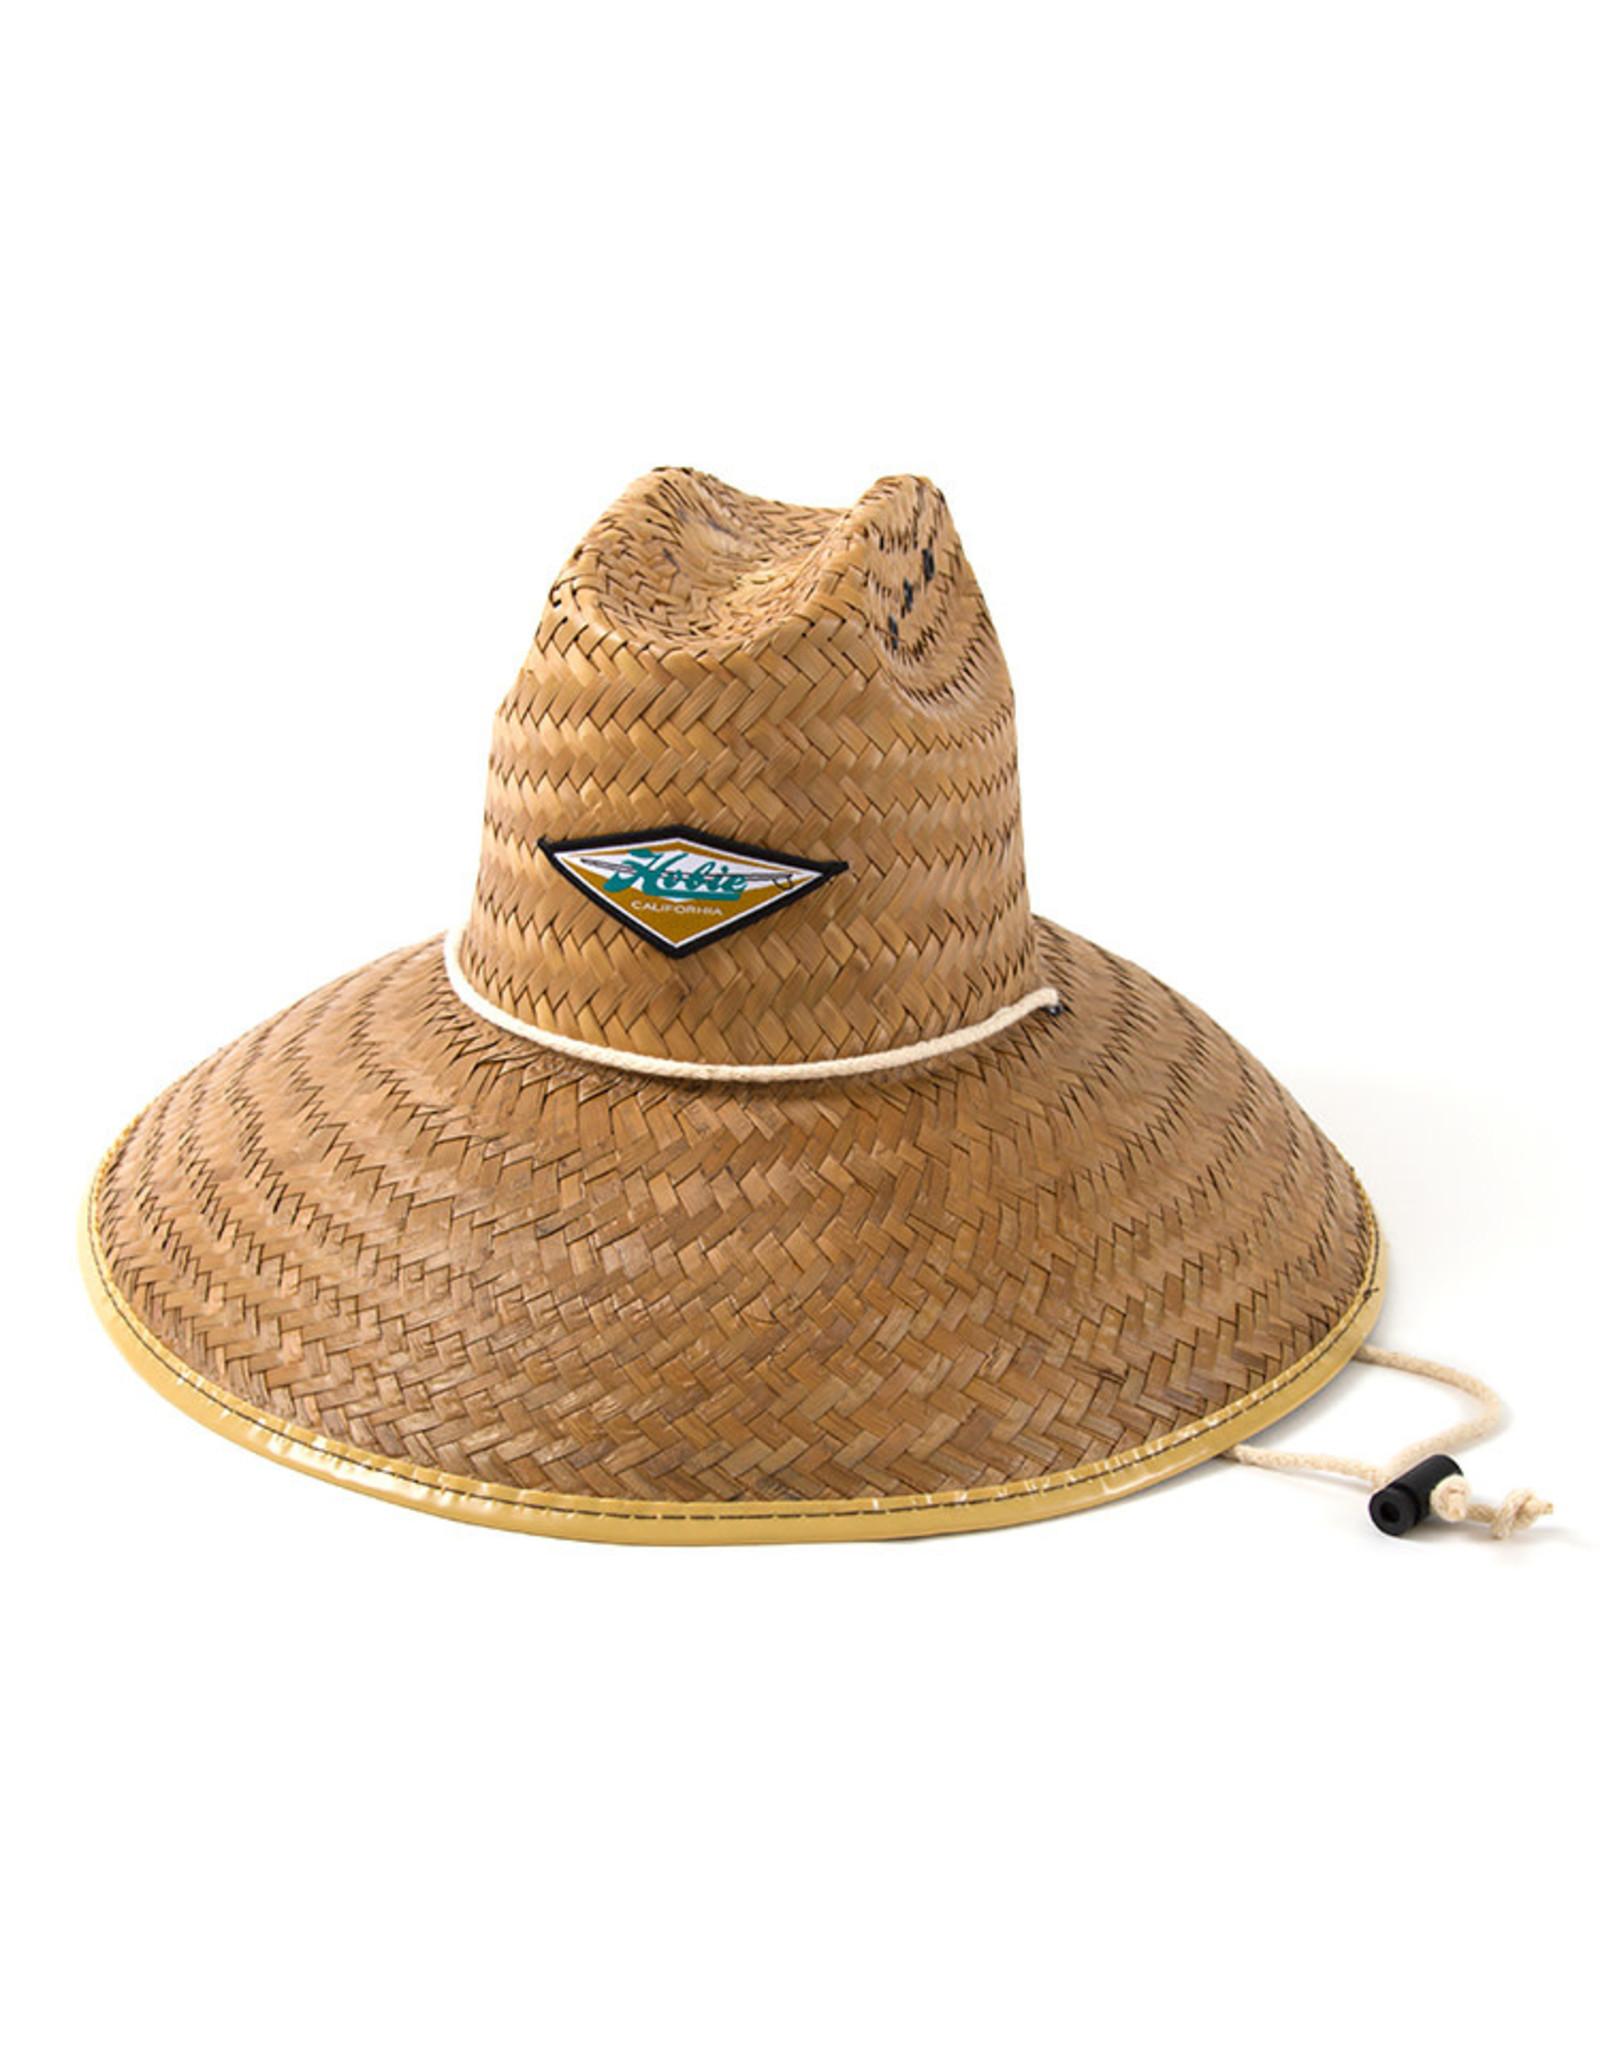 Hobie Hobie Hat, Hobie Lifeguard